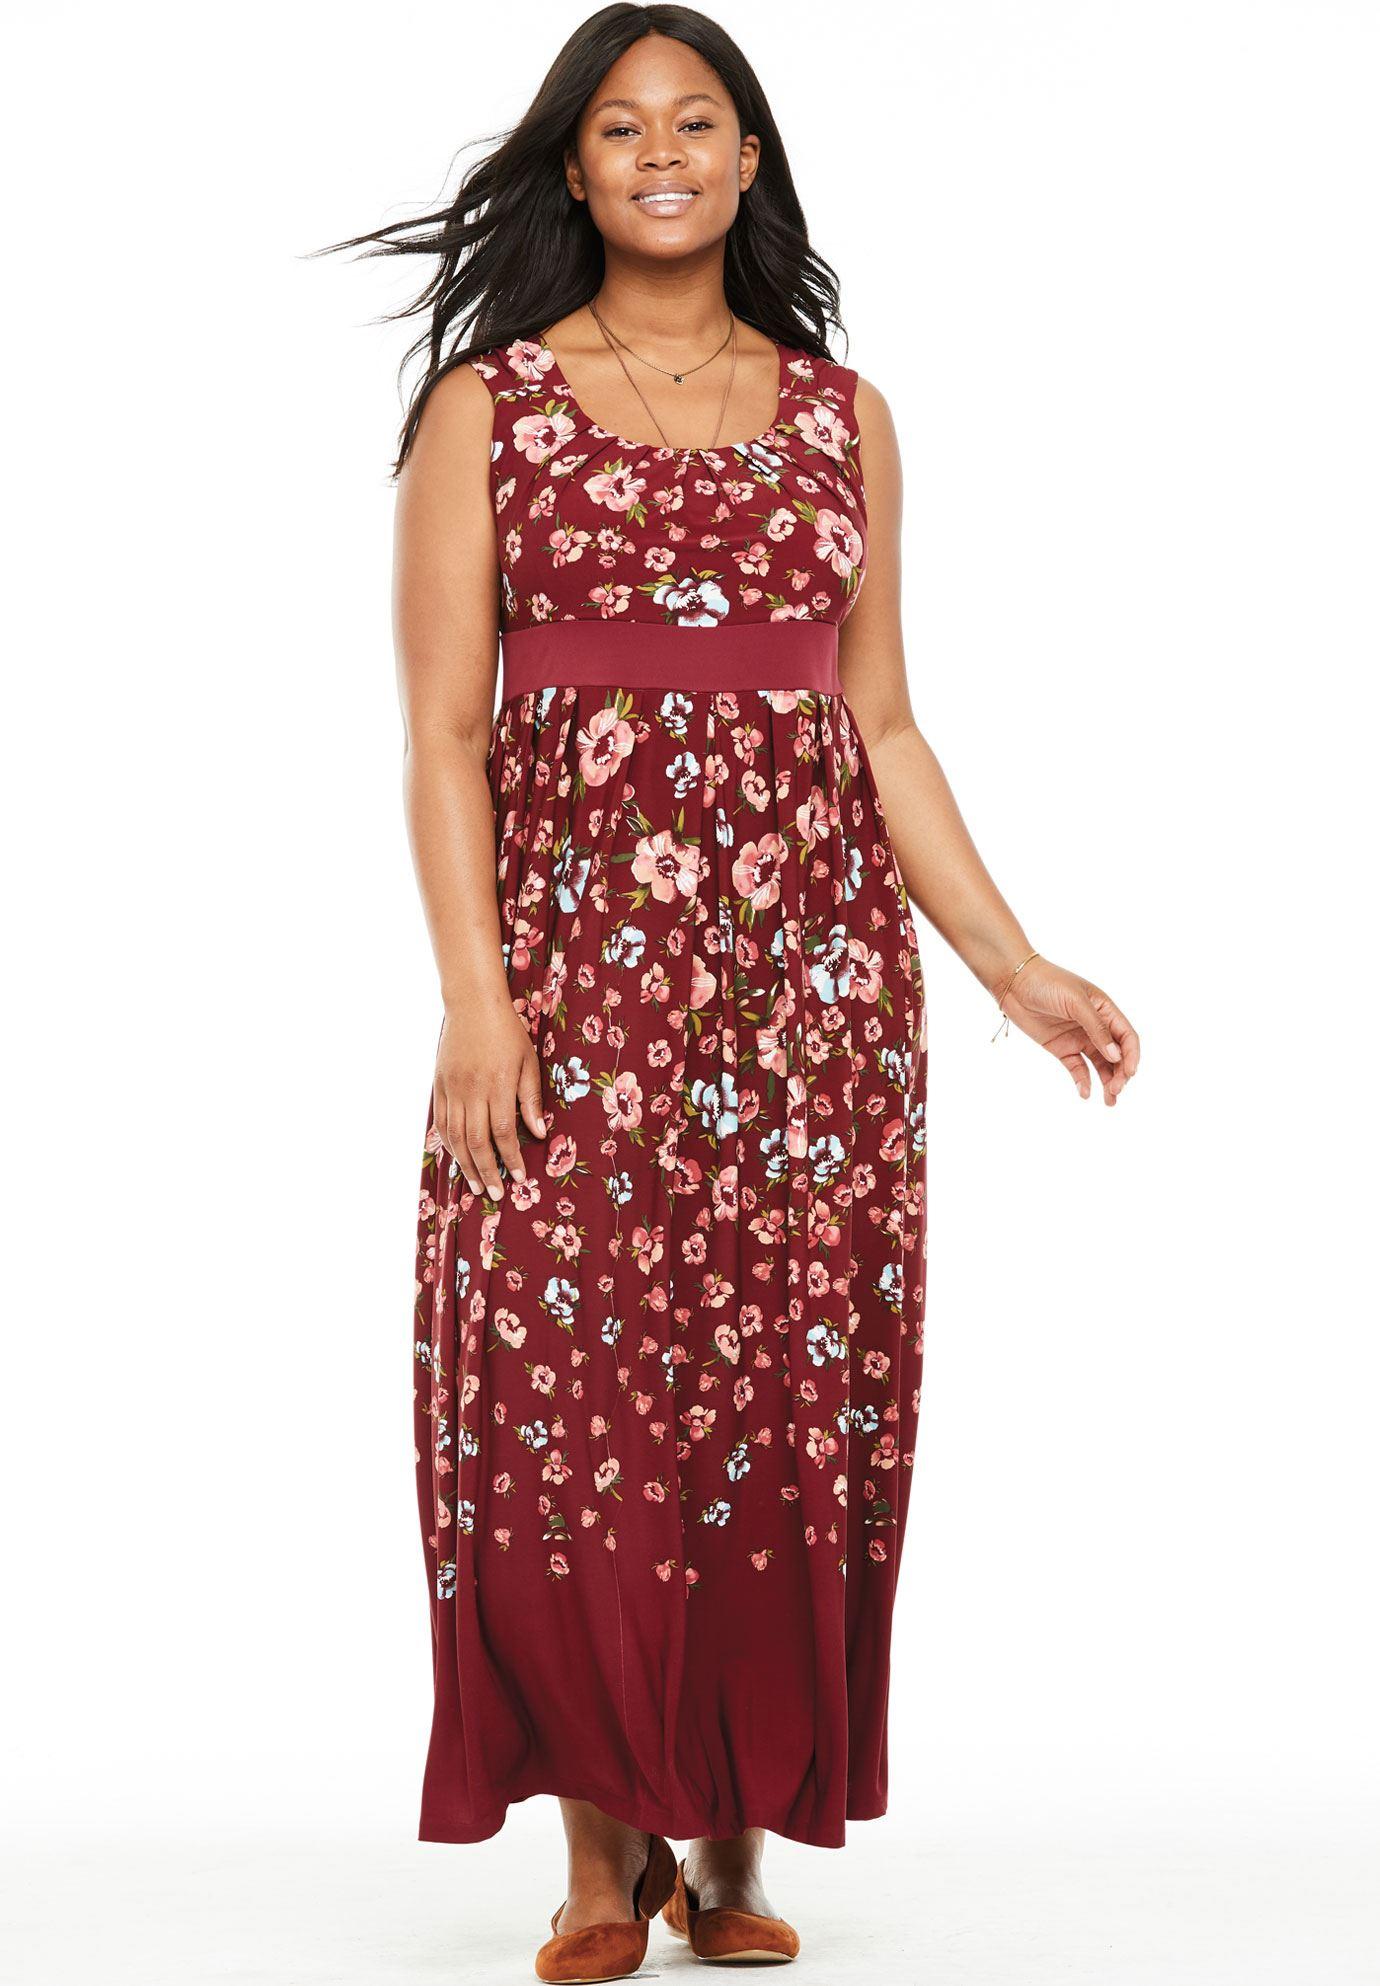 Banded Waist Polka Dot Maxi Dress   Plus Size Maxi Dresses   Full Beauty